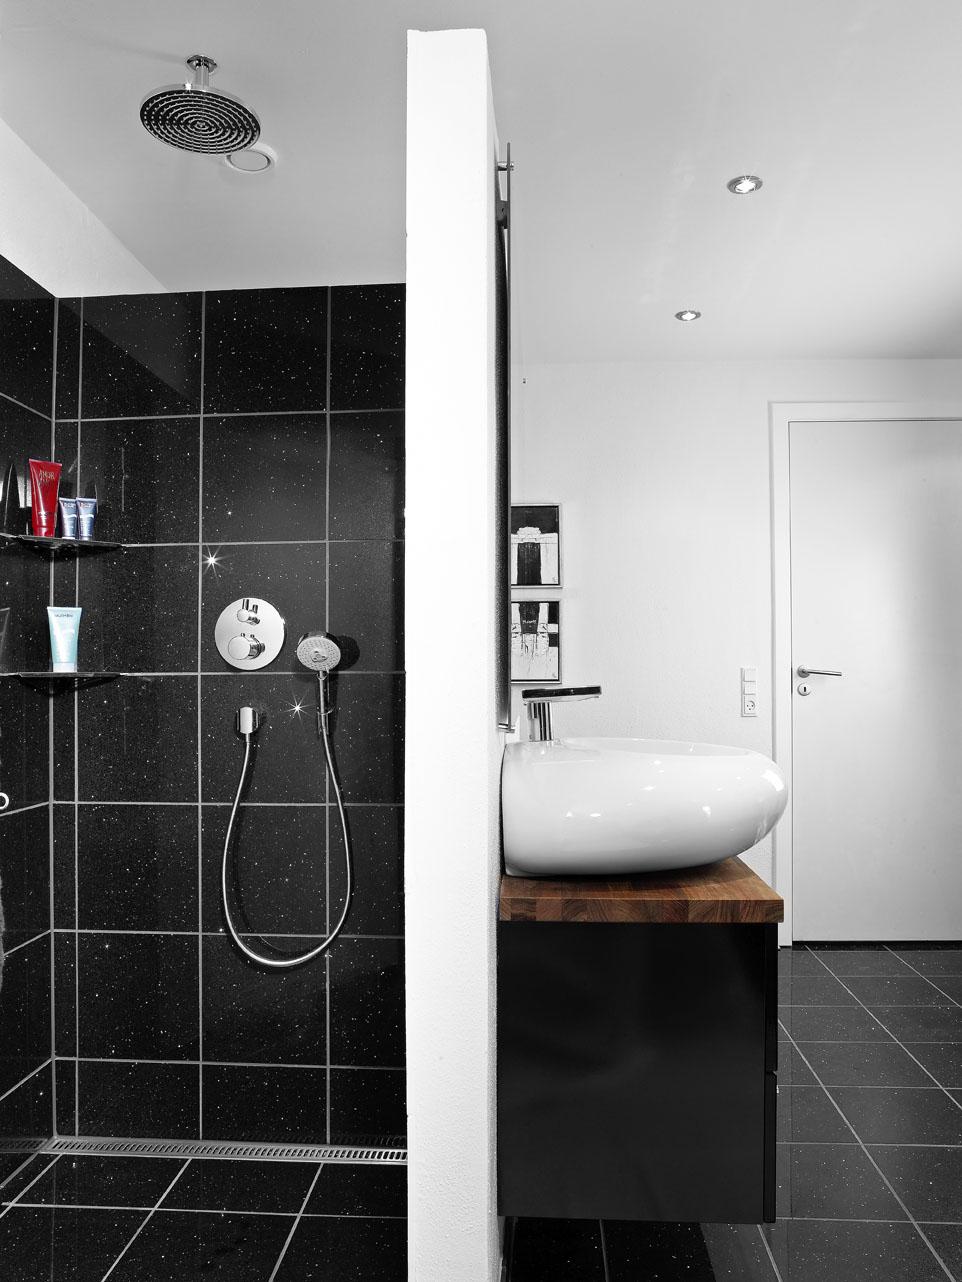 Wet Room Materials, trading name of Advanced Materials Ltd